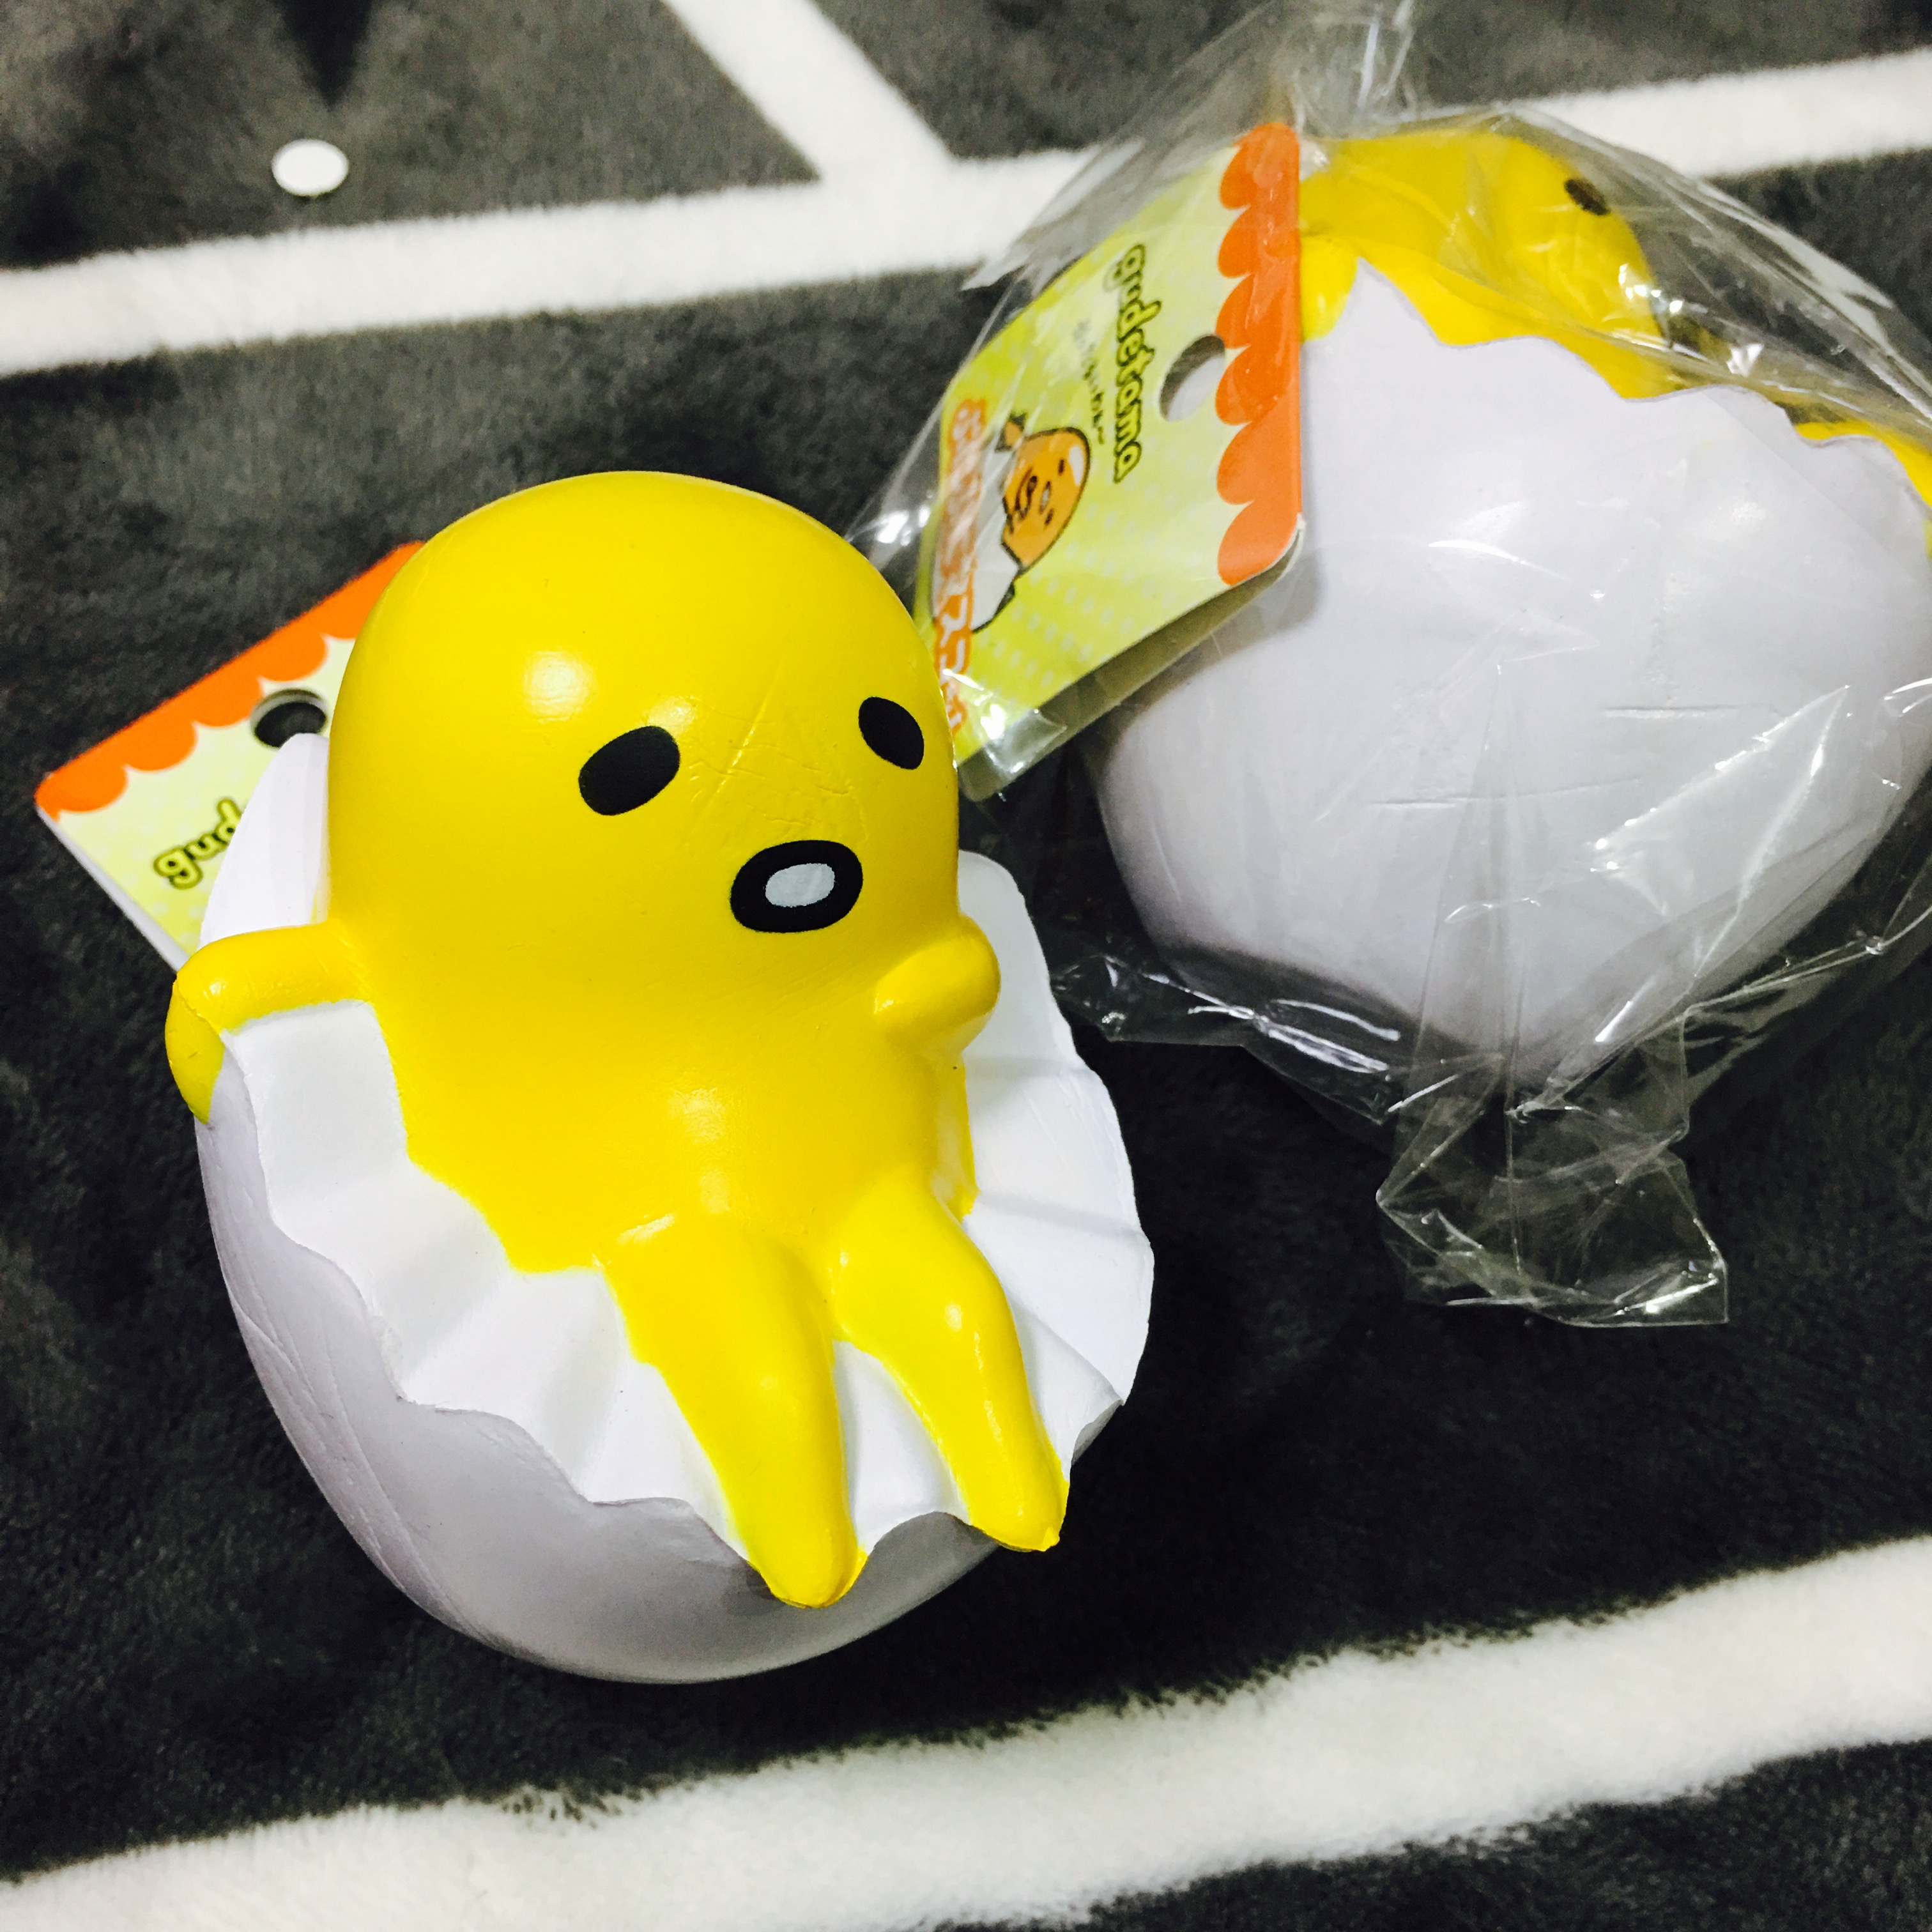 Squishy Muffinz Merch : ~SquishyStuff~ Sanrio Gudetama Egg Squishy Mascot Online Store Powered by Storenvy